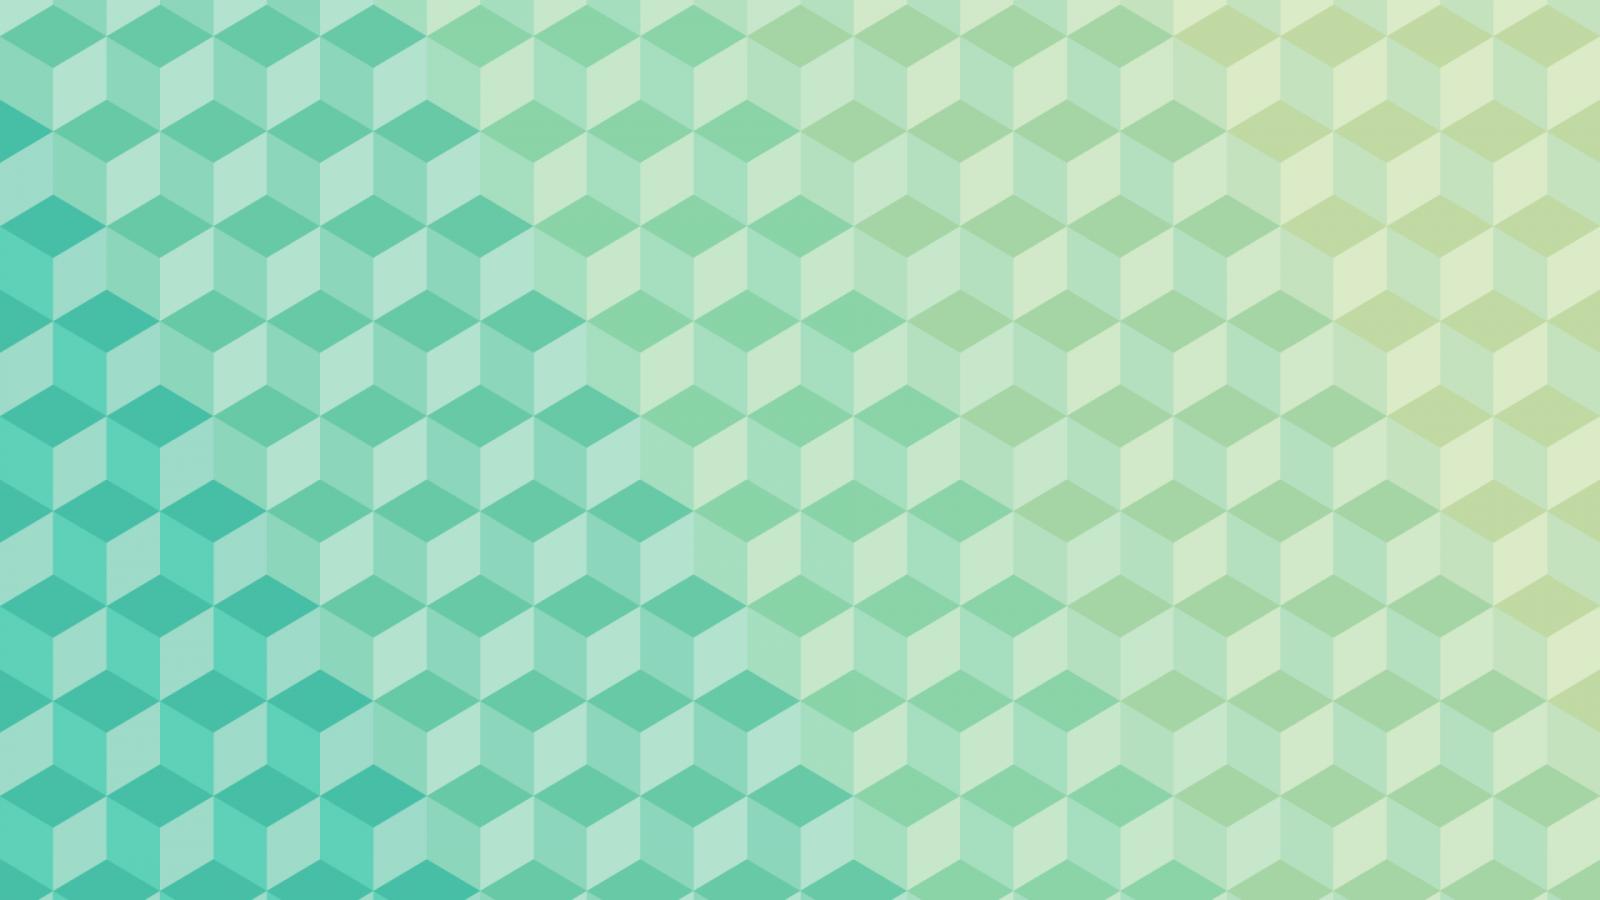 Unduh 900 Wallpaper Abstrak Png  Terbaru